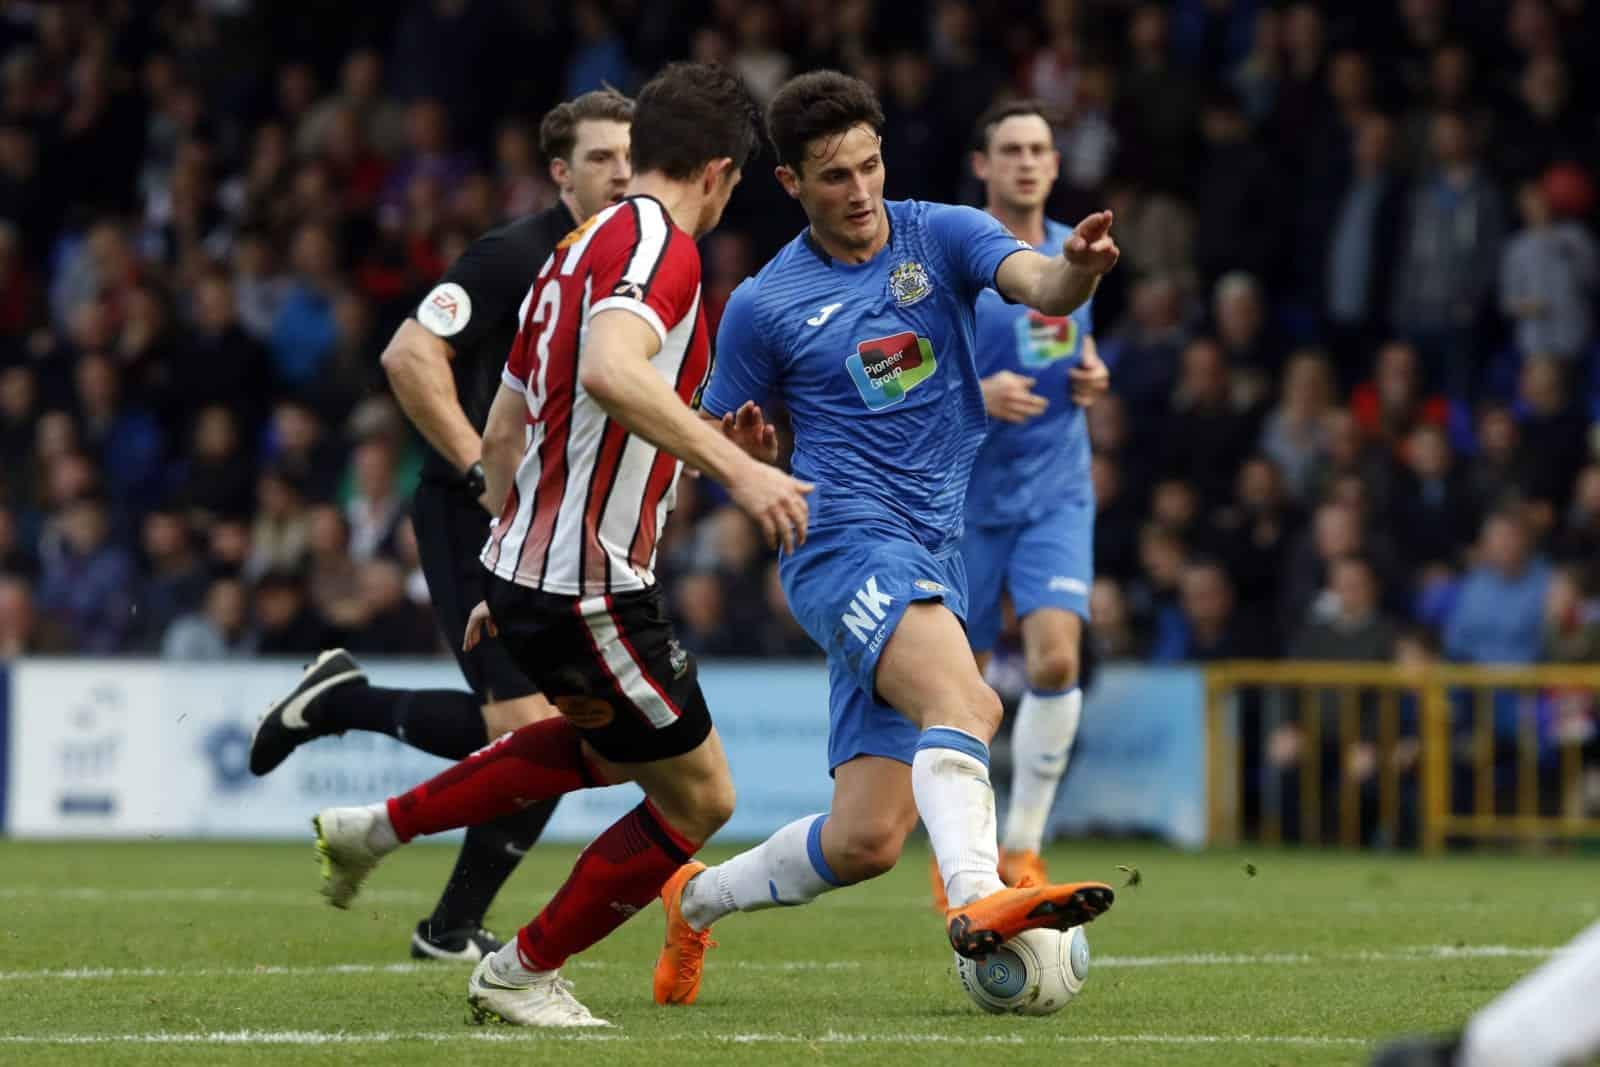 Elliot Osbourne. Stockport County FC 2-0 Altrincham FC. Emirates FA Cup